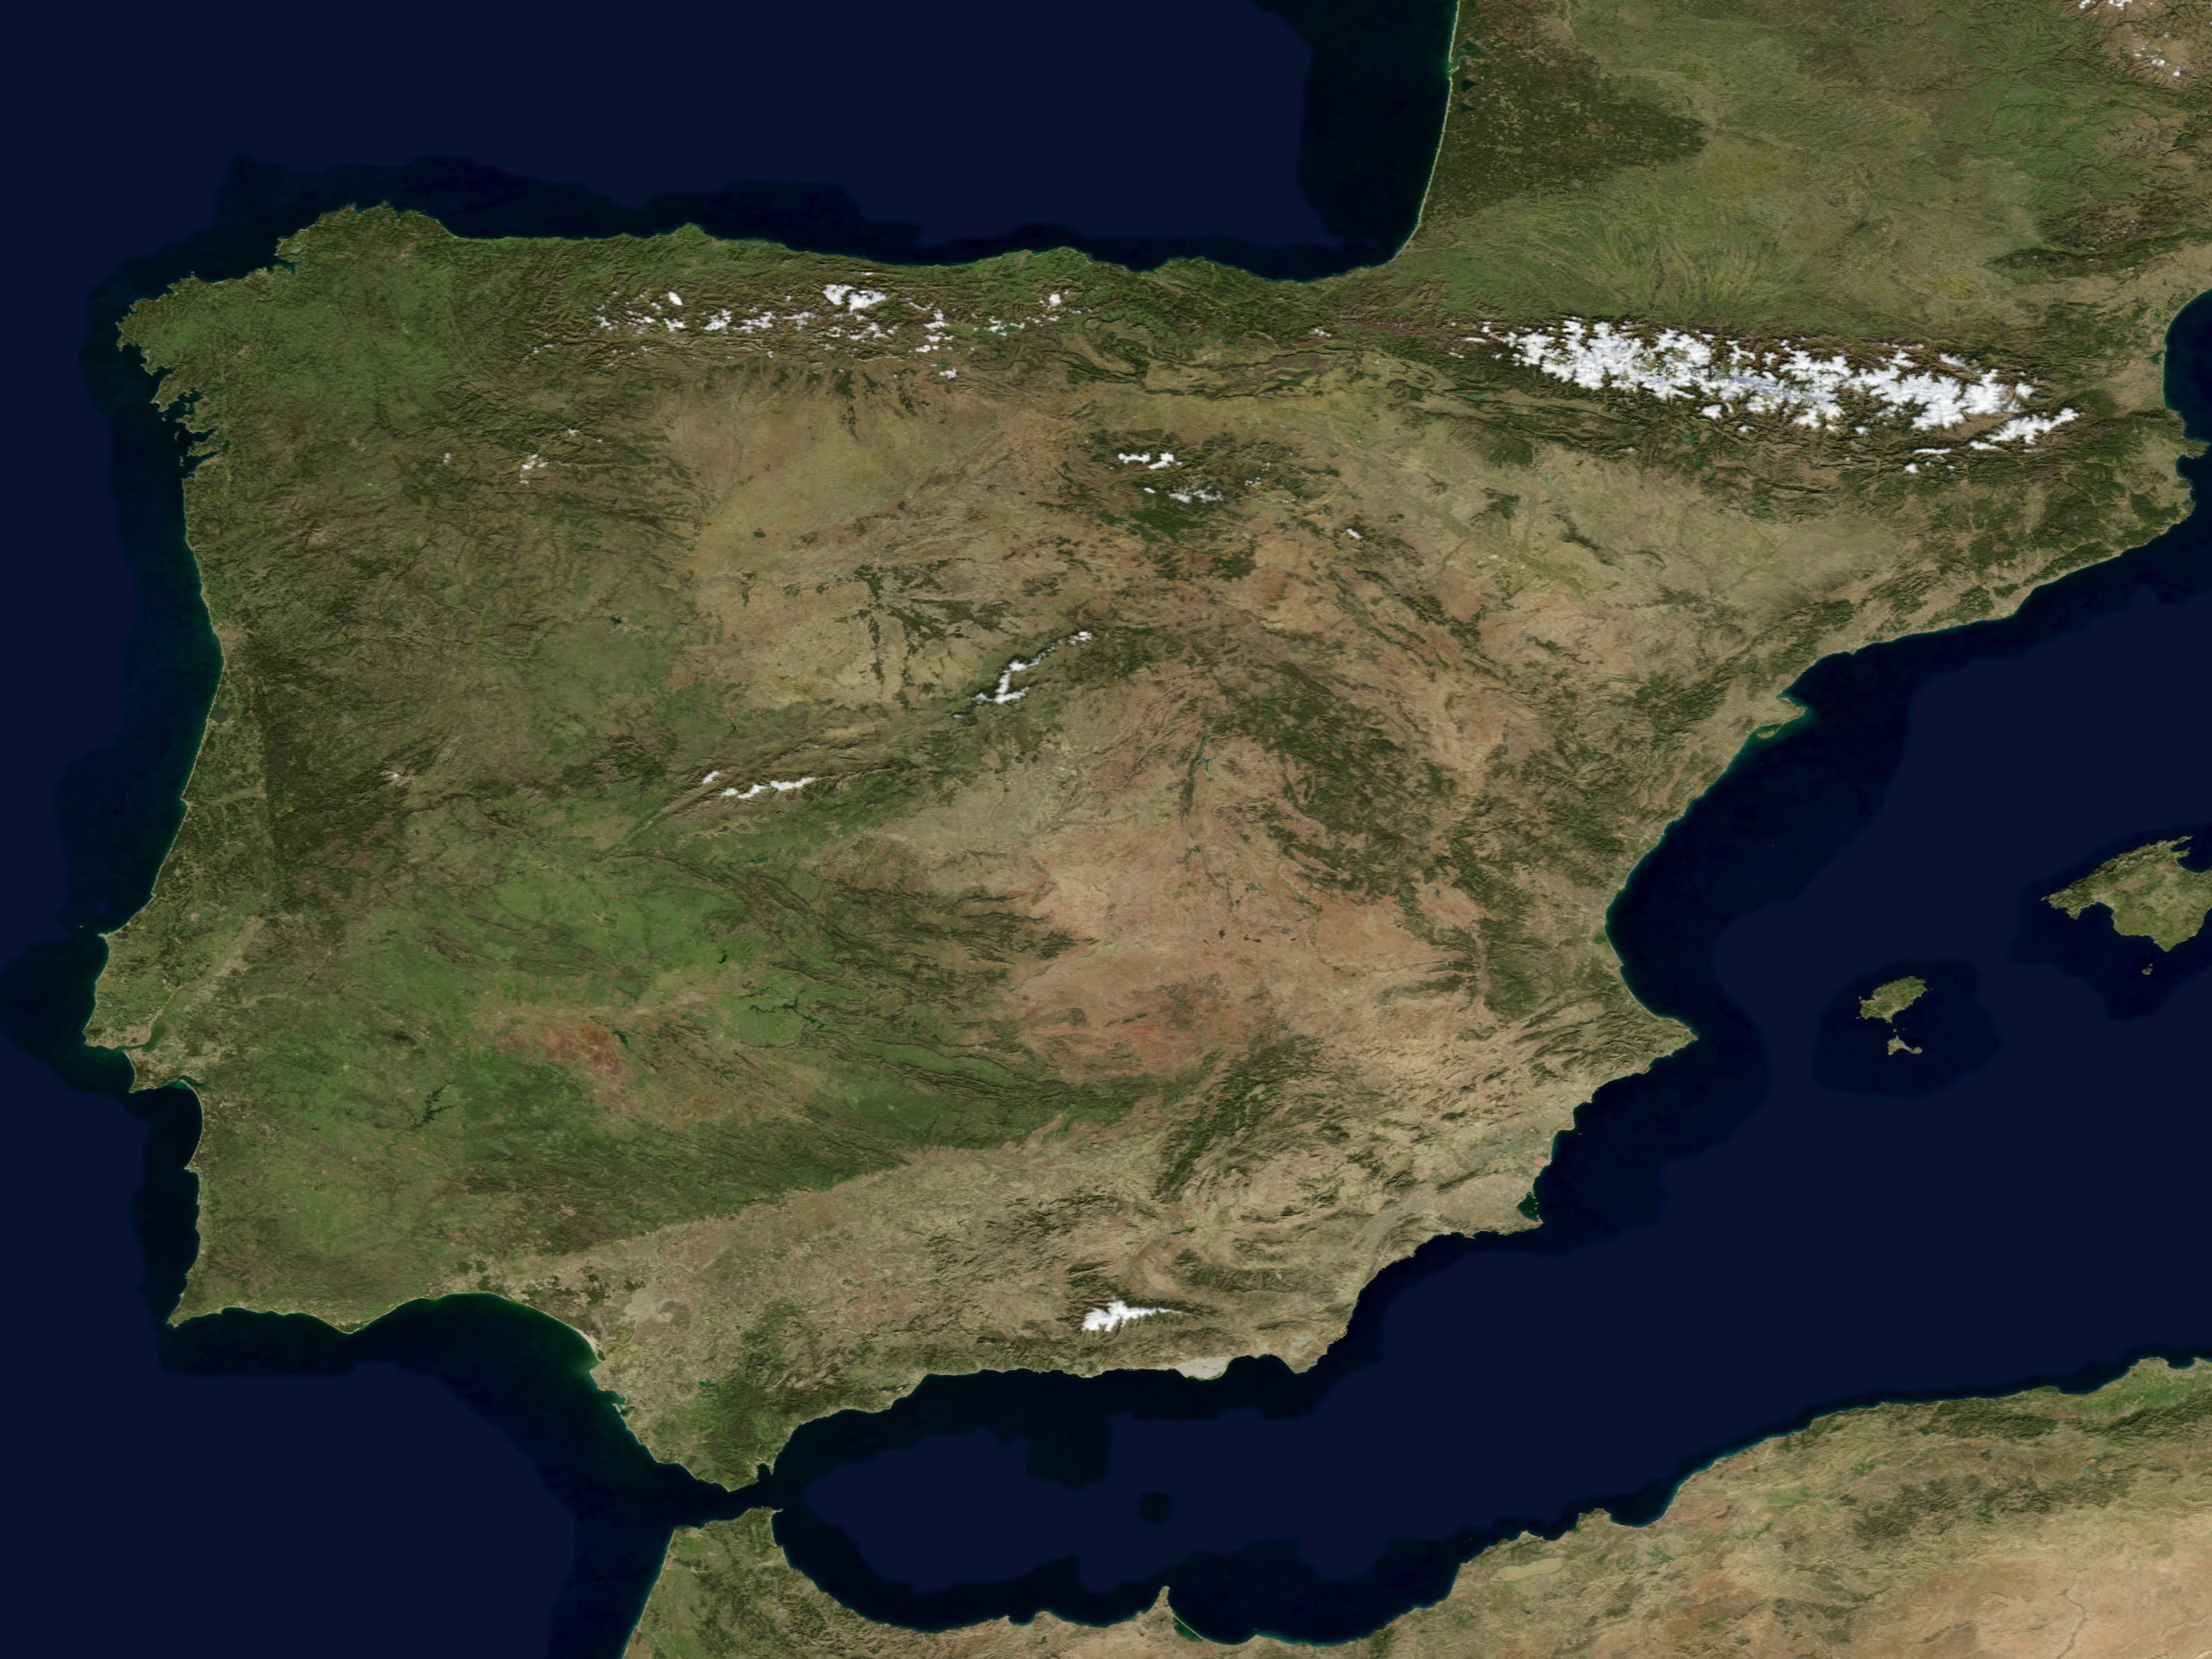 Satellite Map Of Spain.File Satellite Image Of Spain In January 2004 Jpg Wikimedia Commons